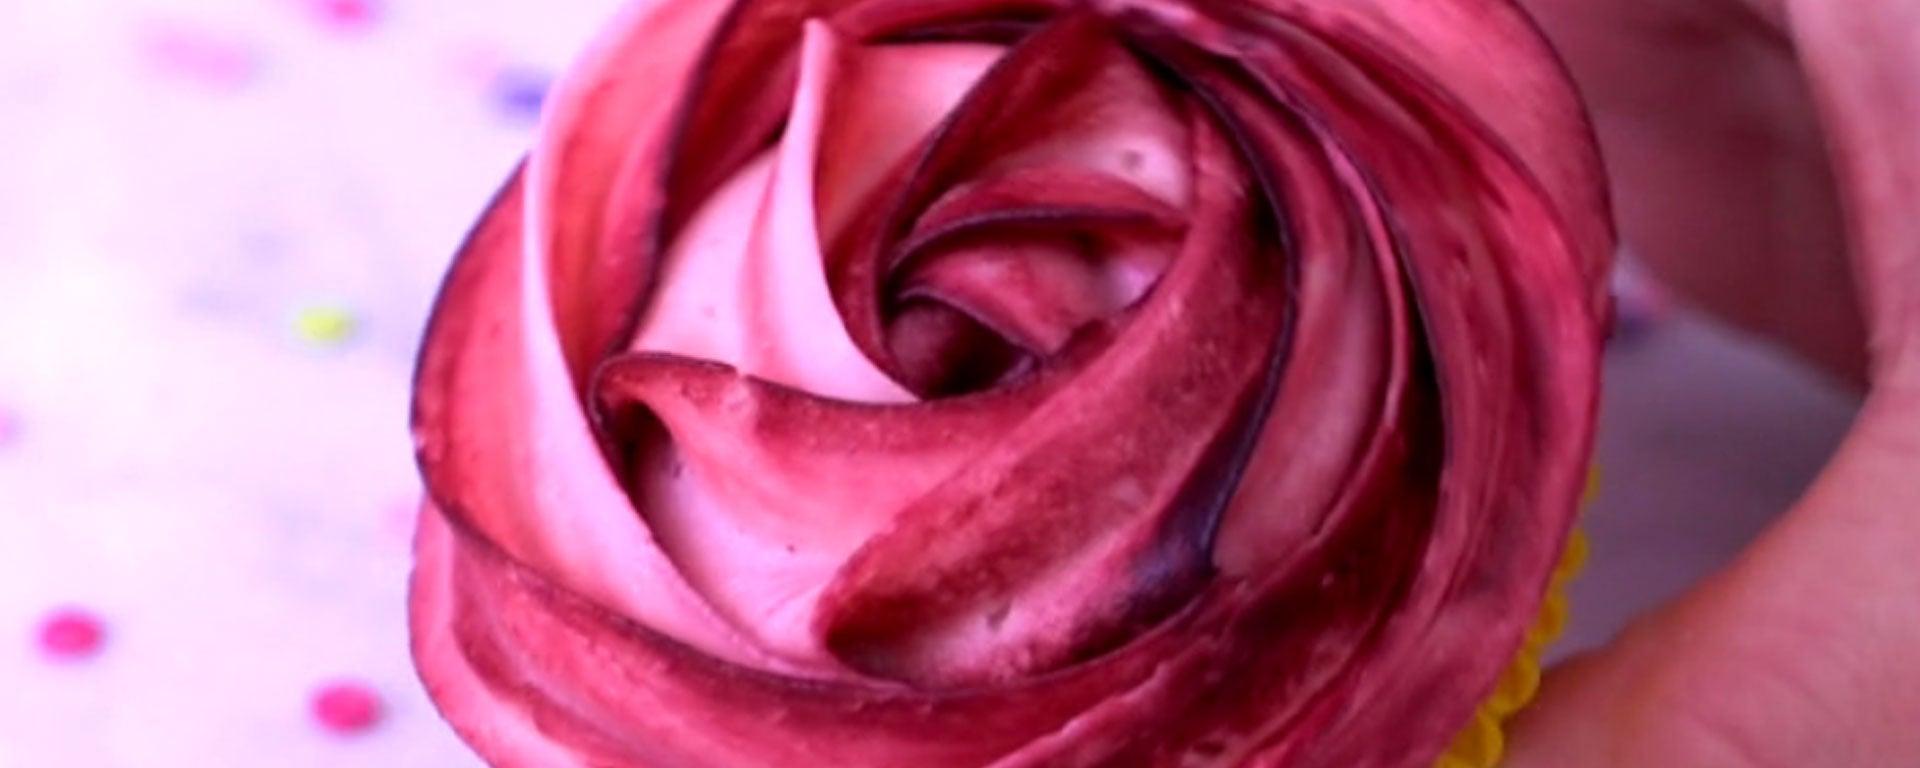 Rose-Icing_Header.jpg